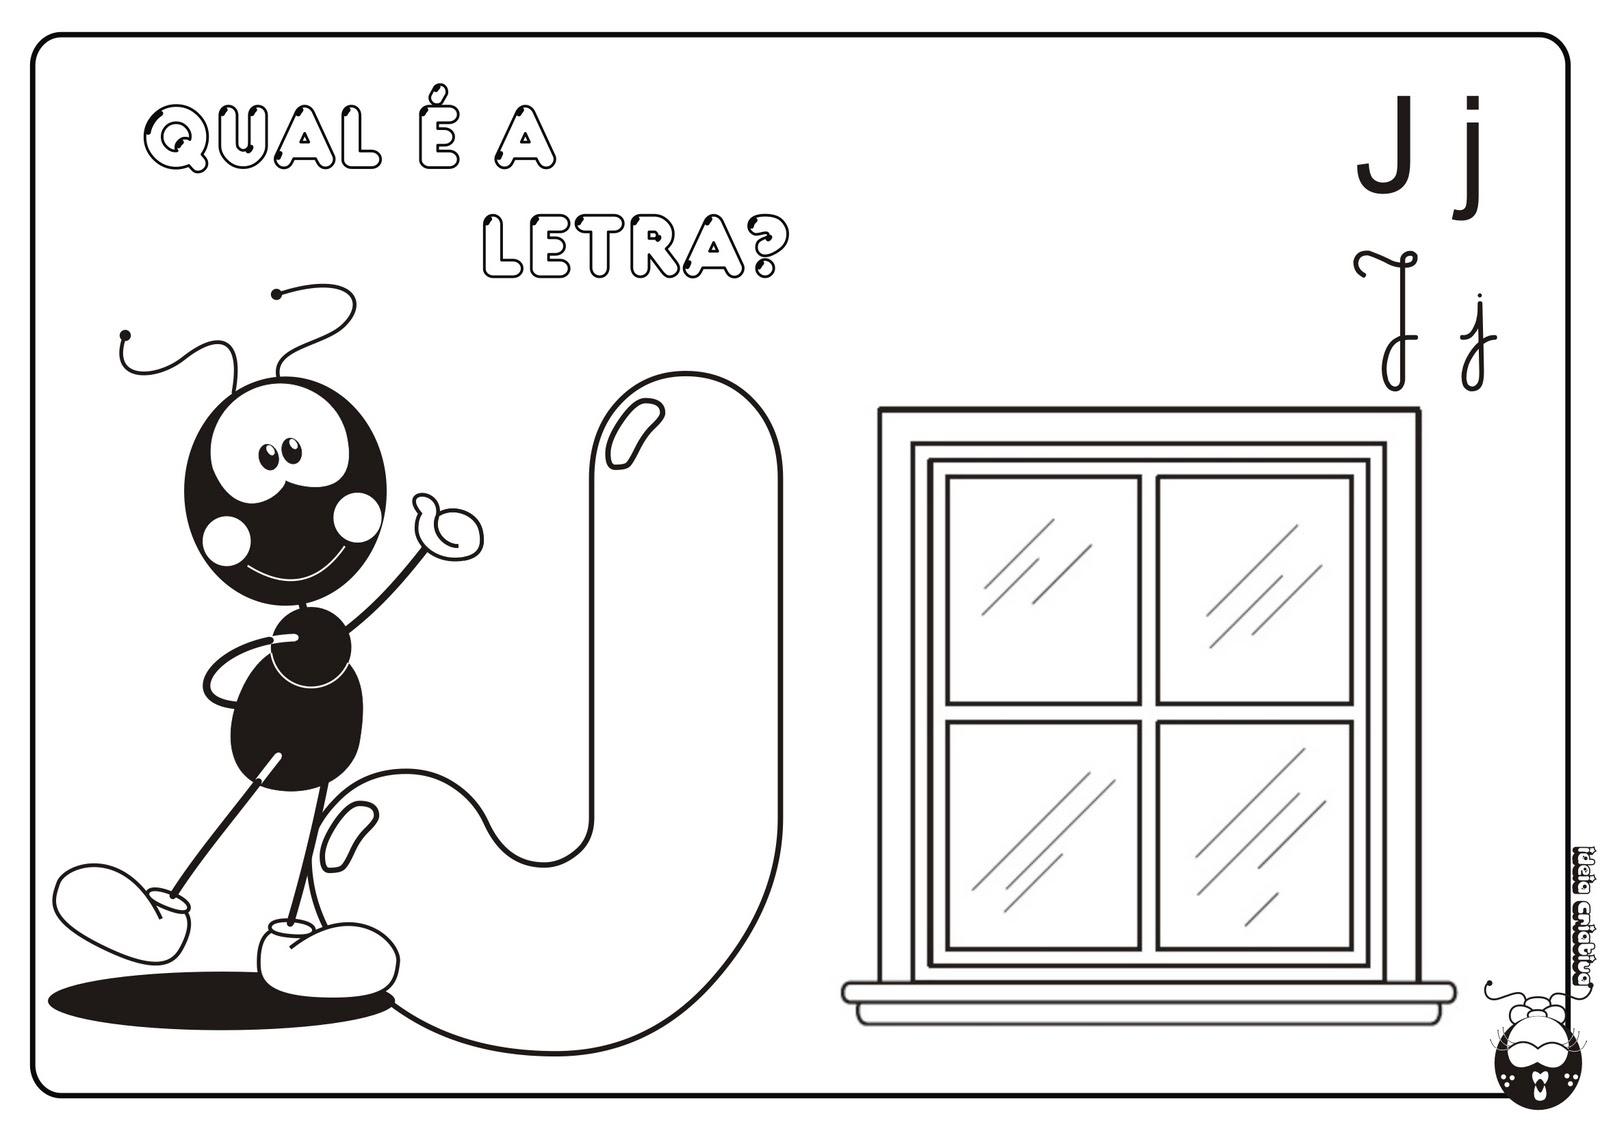 Alfabeto Smilinguido 4 tipos de letra para Baixar Grátis Letra J